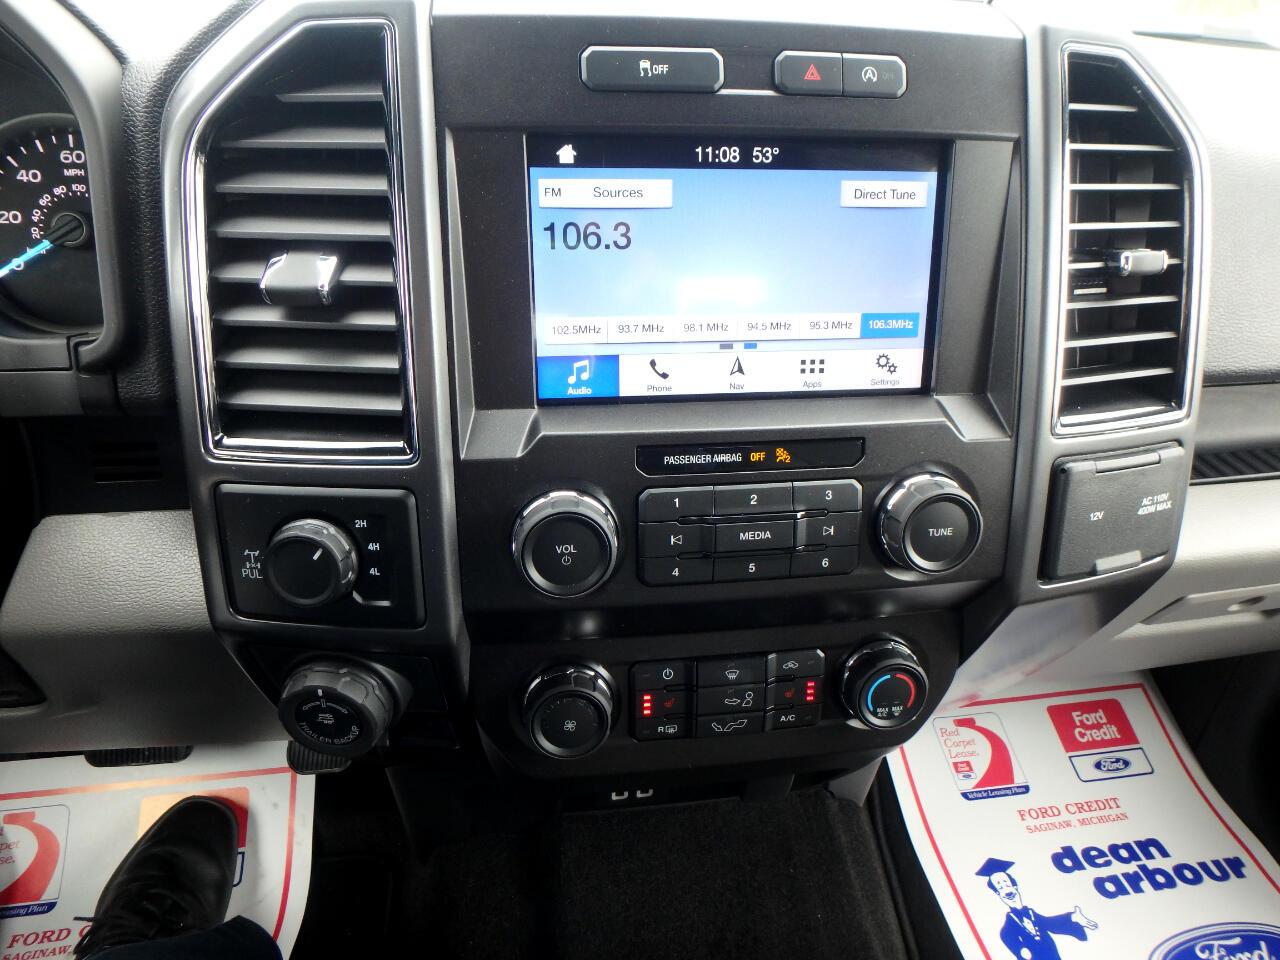 2019 Ford F-150 XLT SuperCrew Short Box 4WD